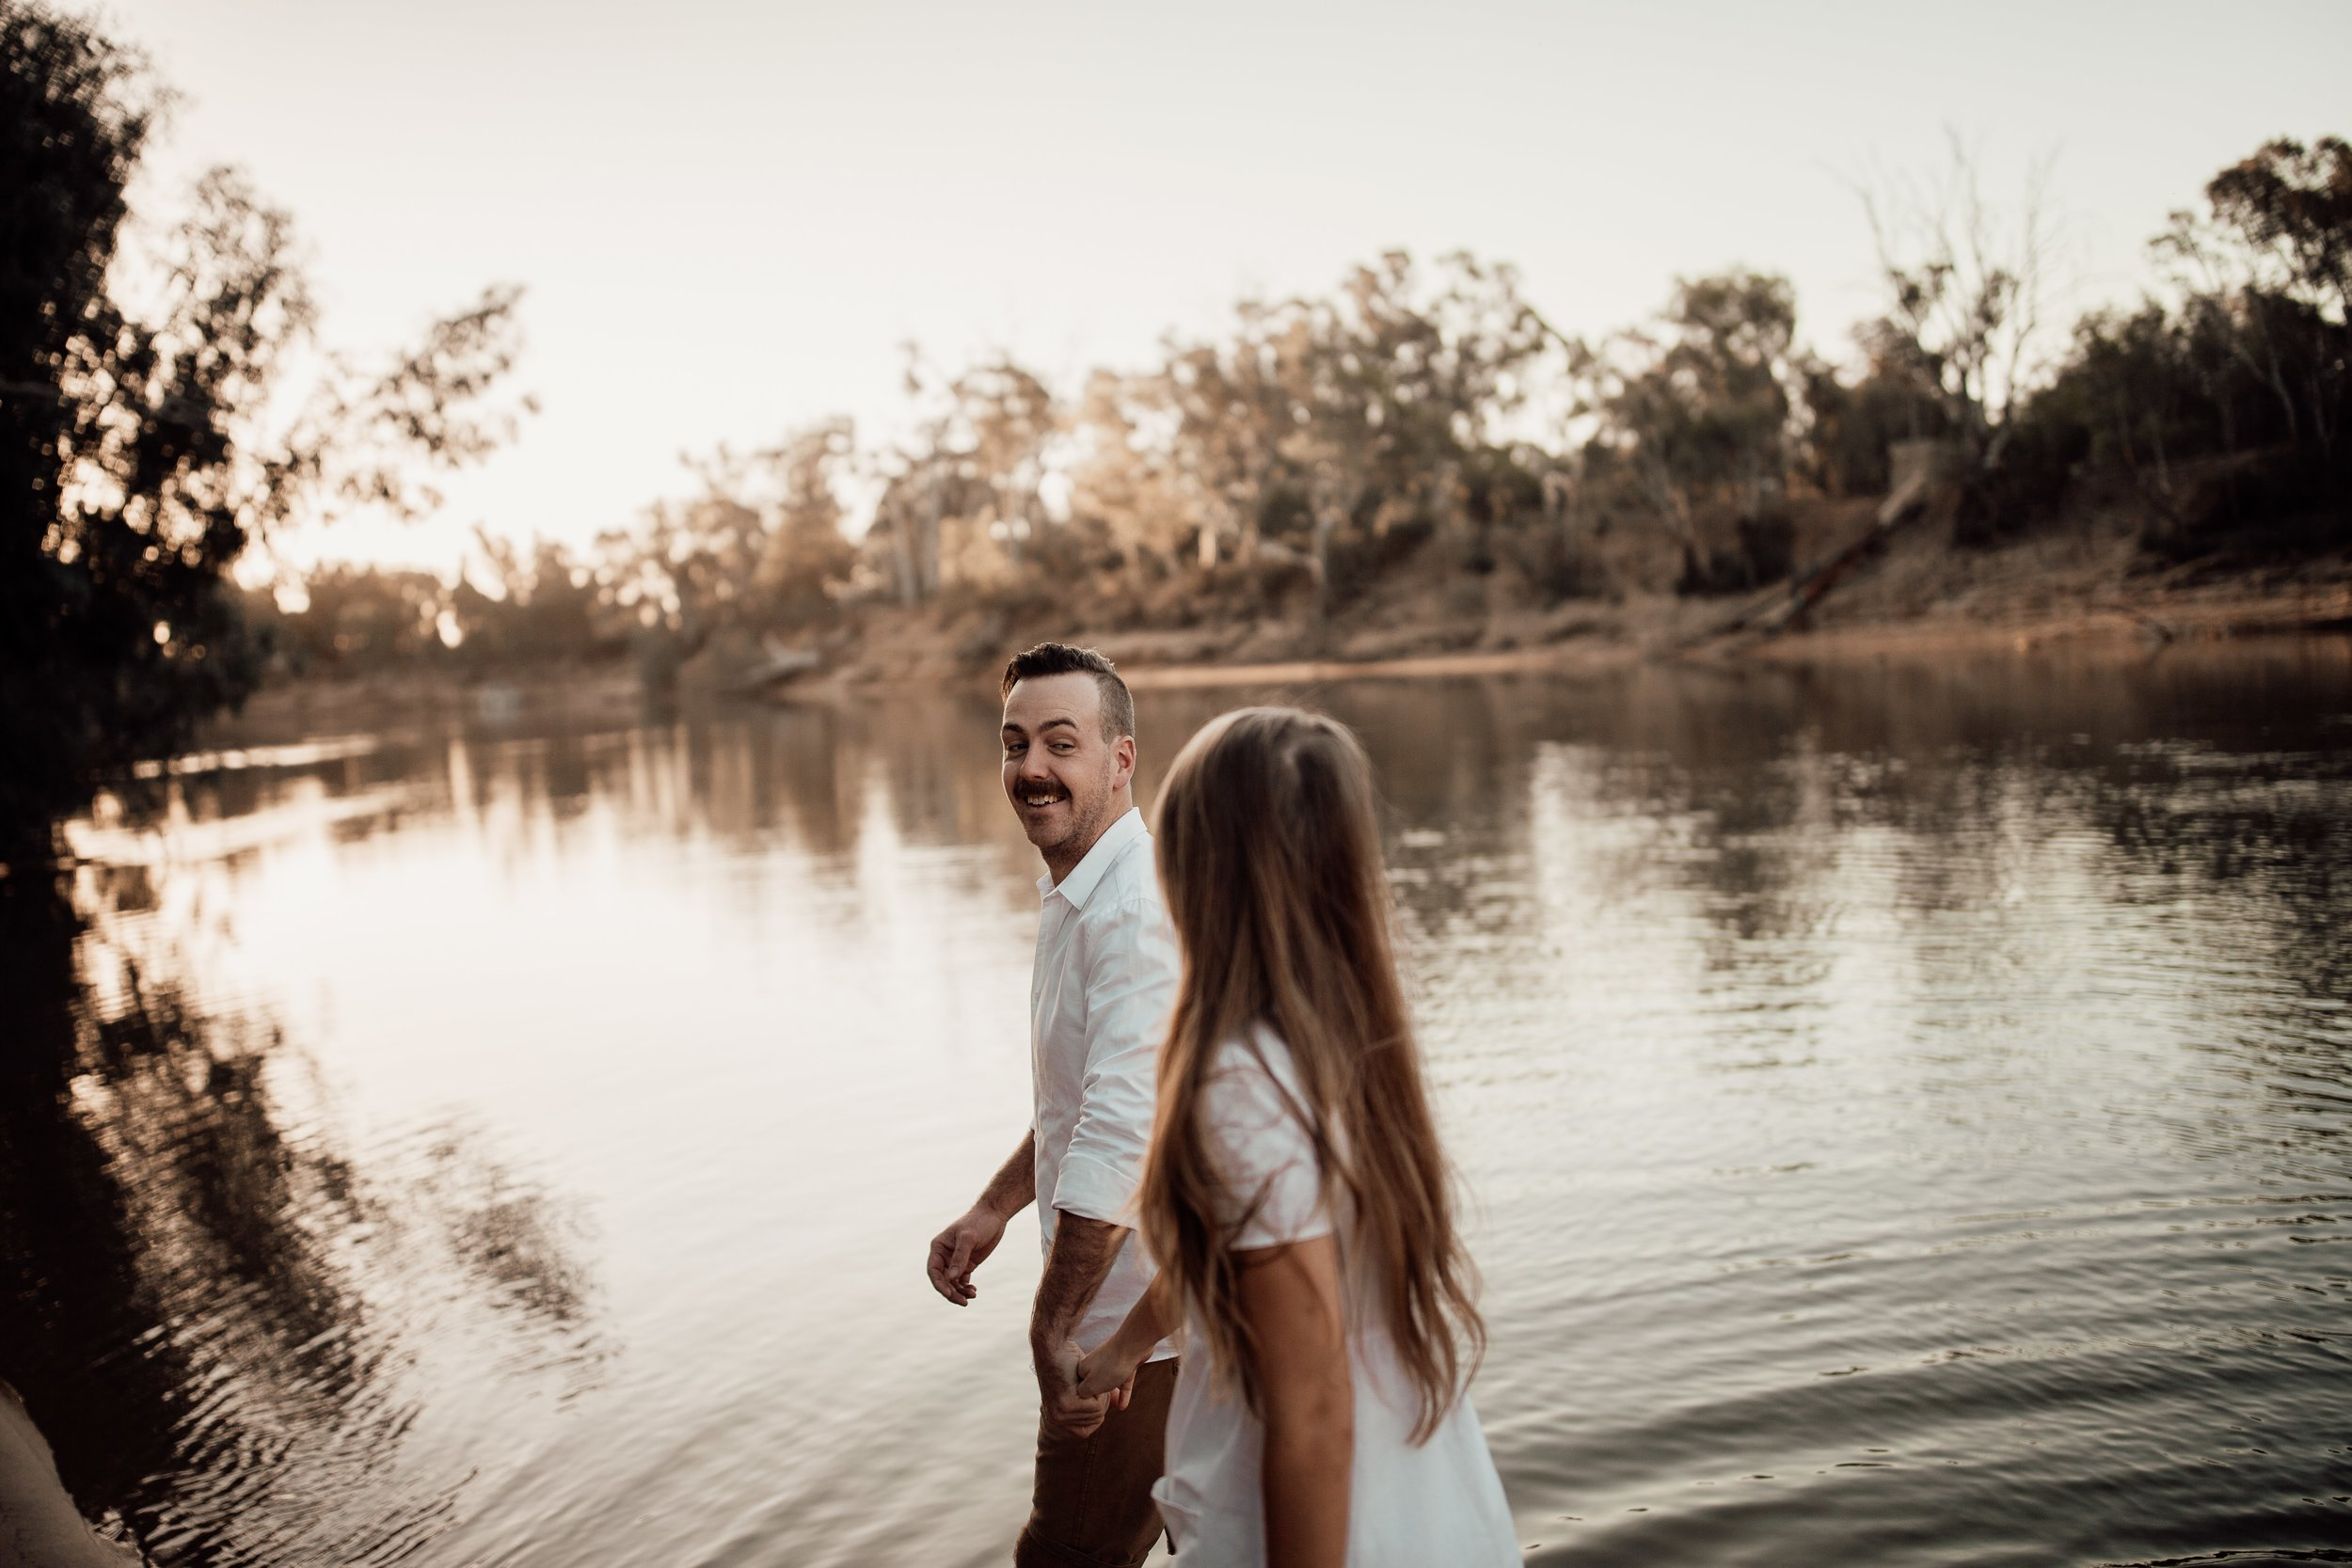 mickalathomas_puremacphotography_weddingphotographer_couplephotographer_Sheppartonphotographer_2848.jpg